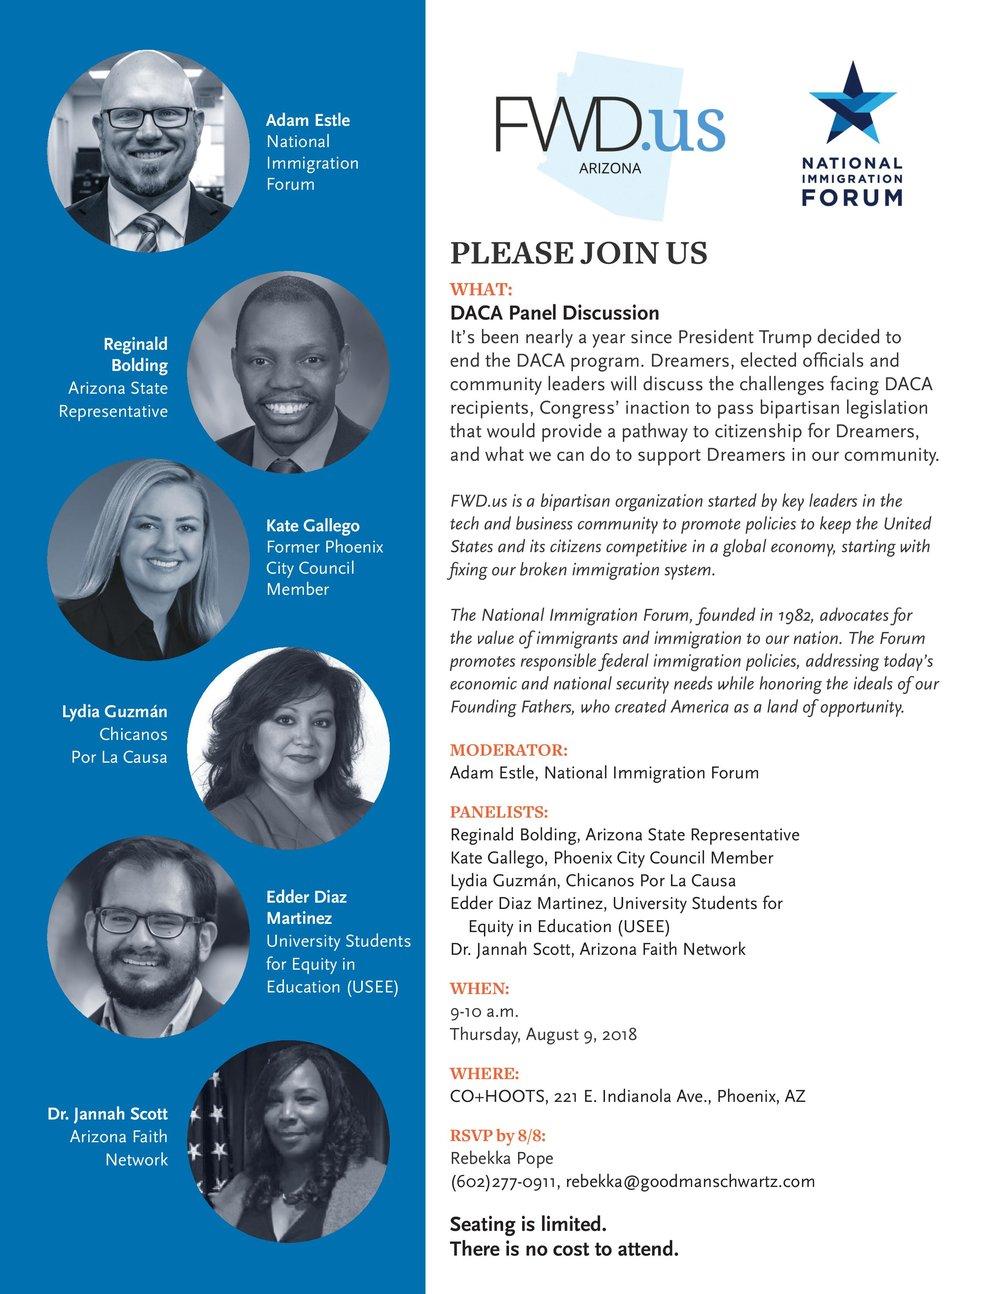 DACA Panel Discussion 8.9.18.jpg